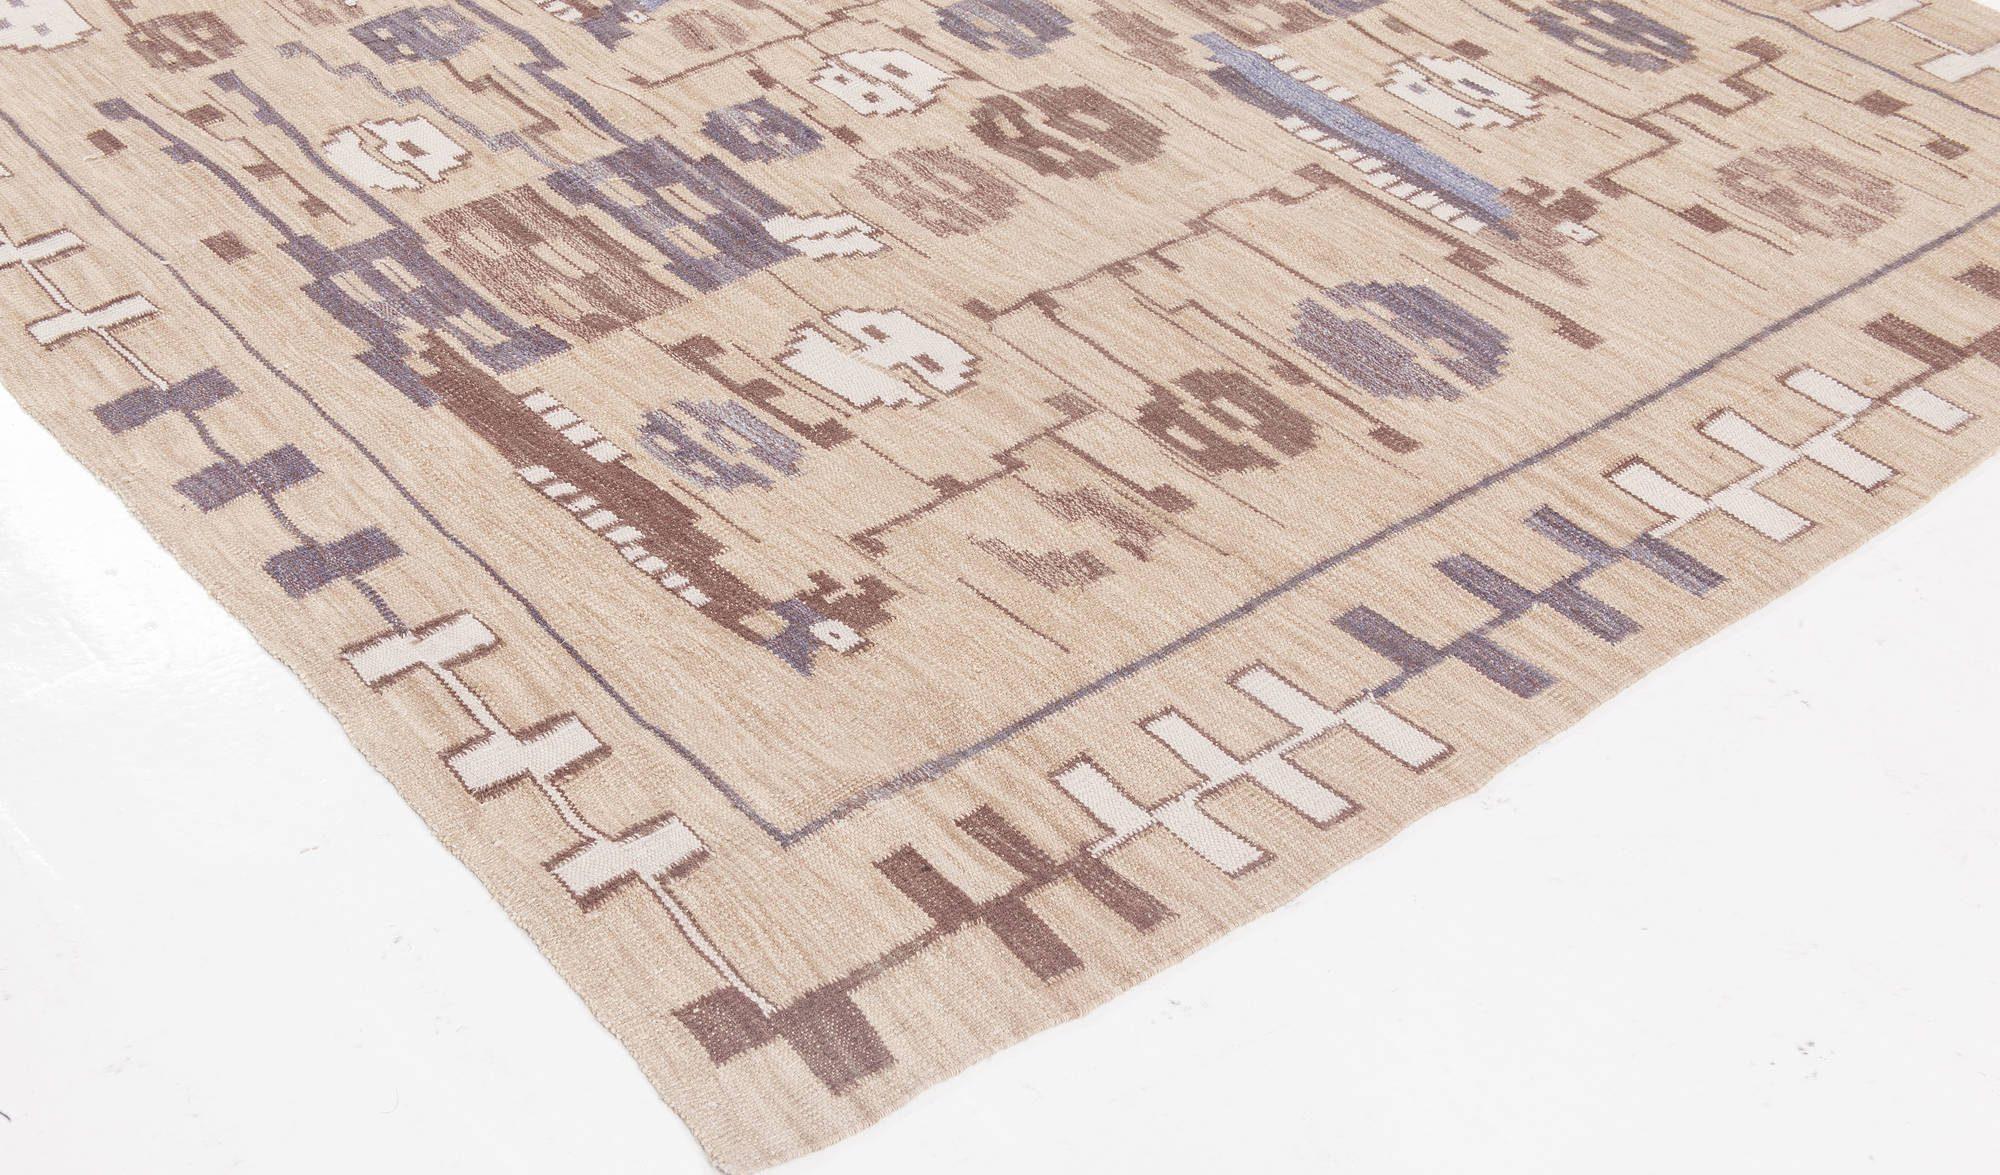 Swedish Design Camel, Beige, Brown and Blue Flat-woven Wool Rug N11673